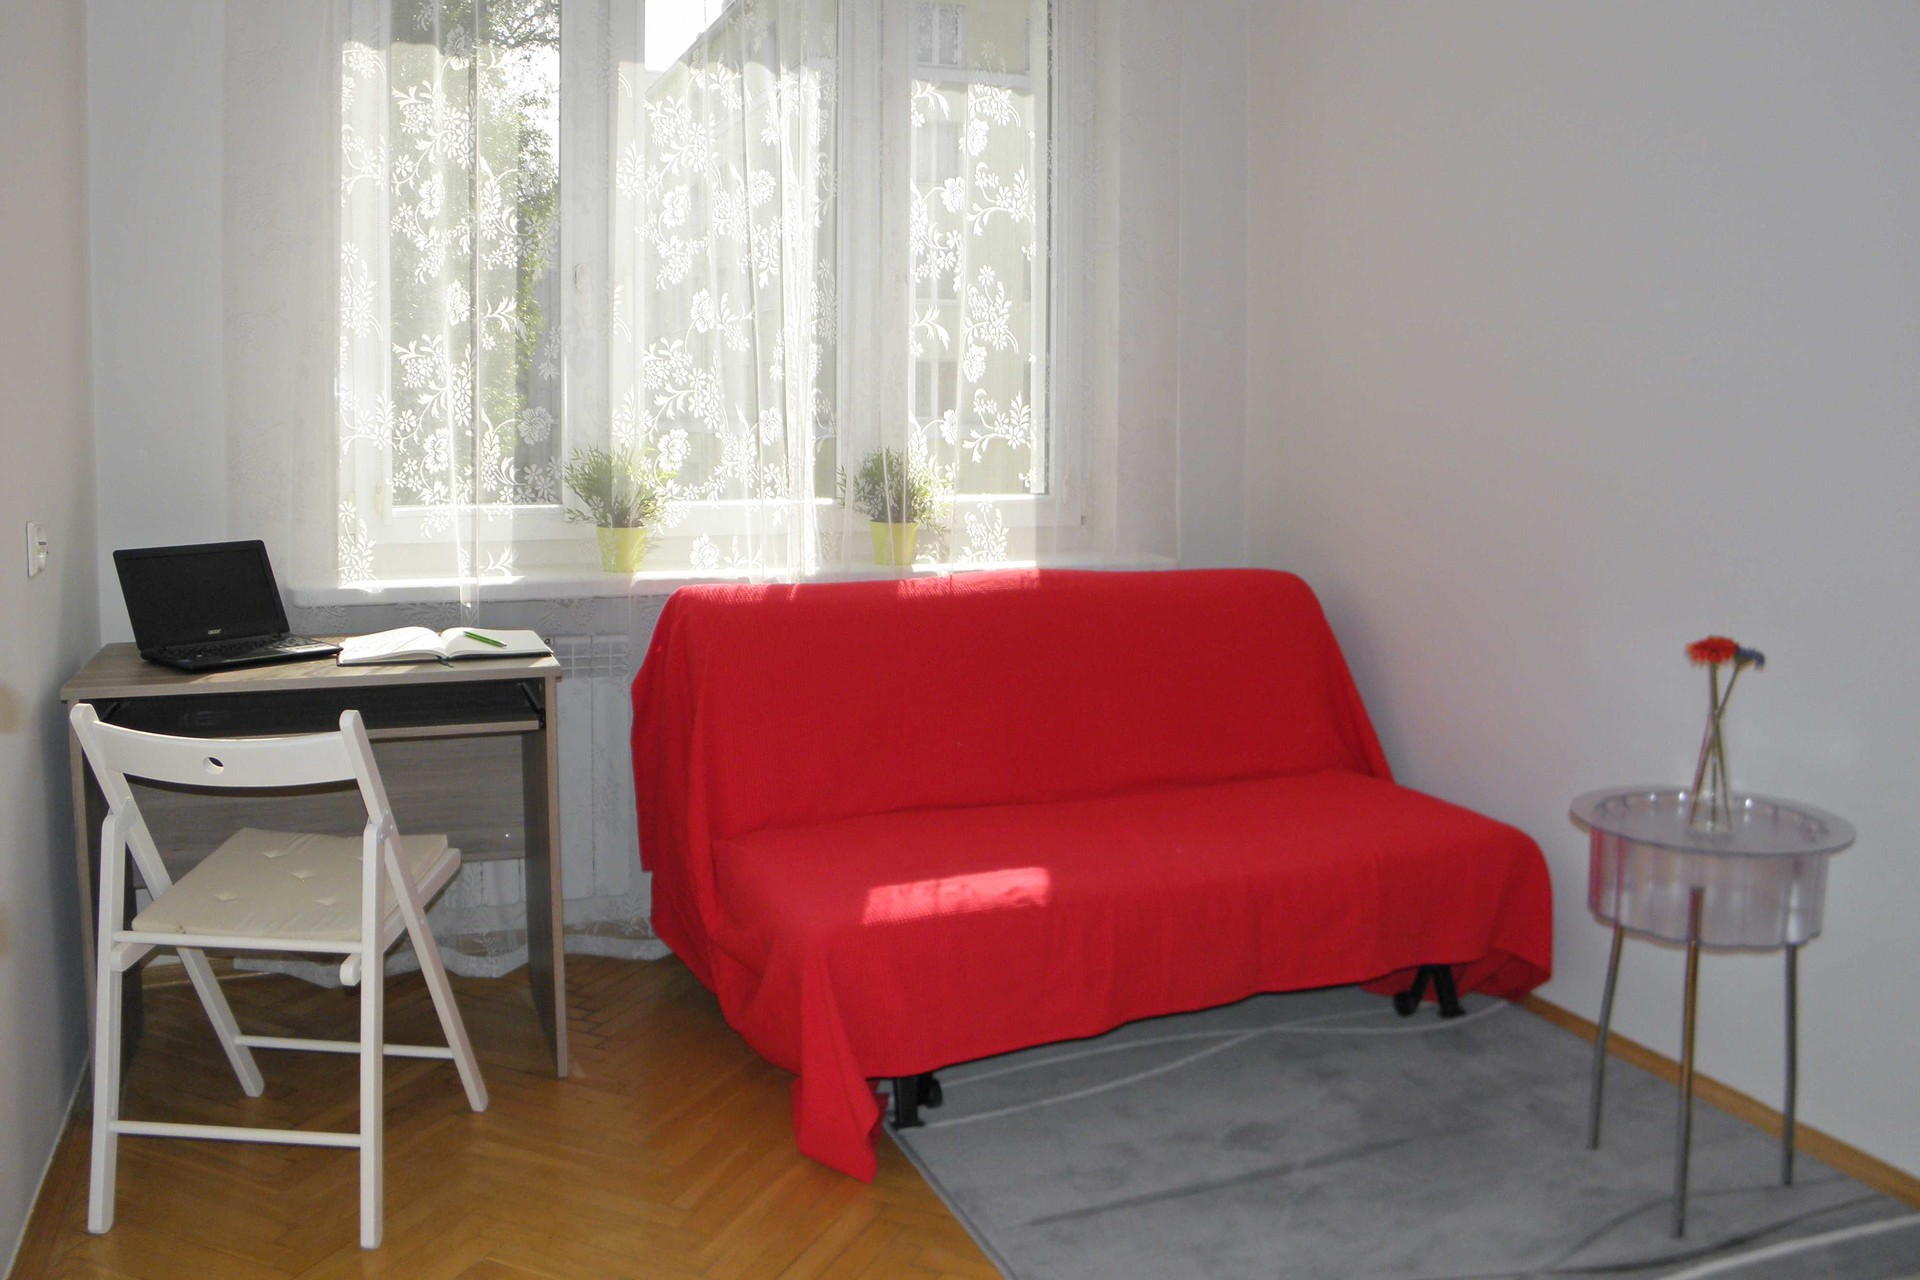 room-rent-free-internet-close-swps-university-city-center-8910580c433c9301e1a31c44d58152bd